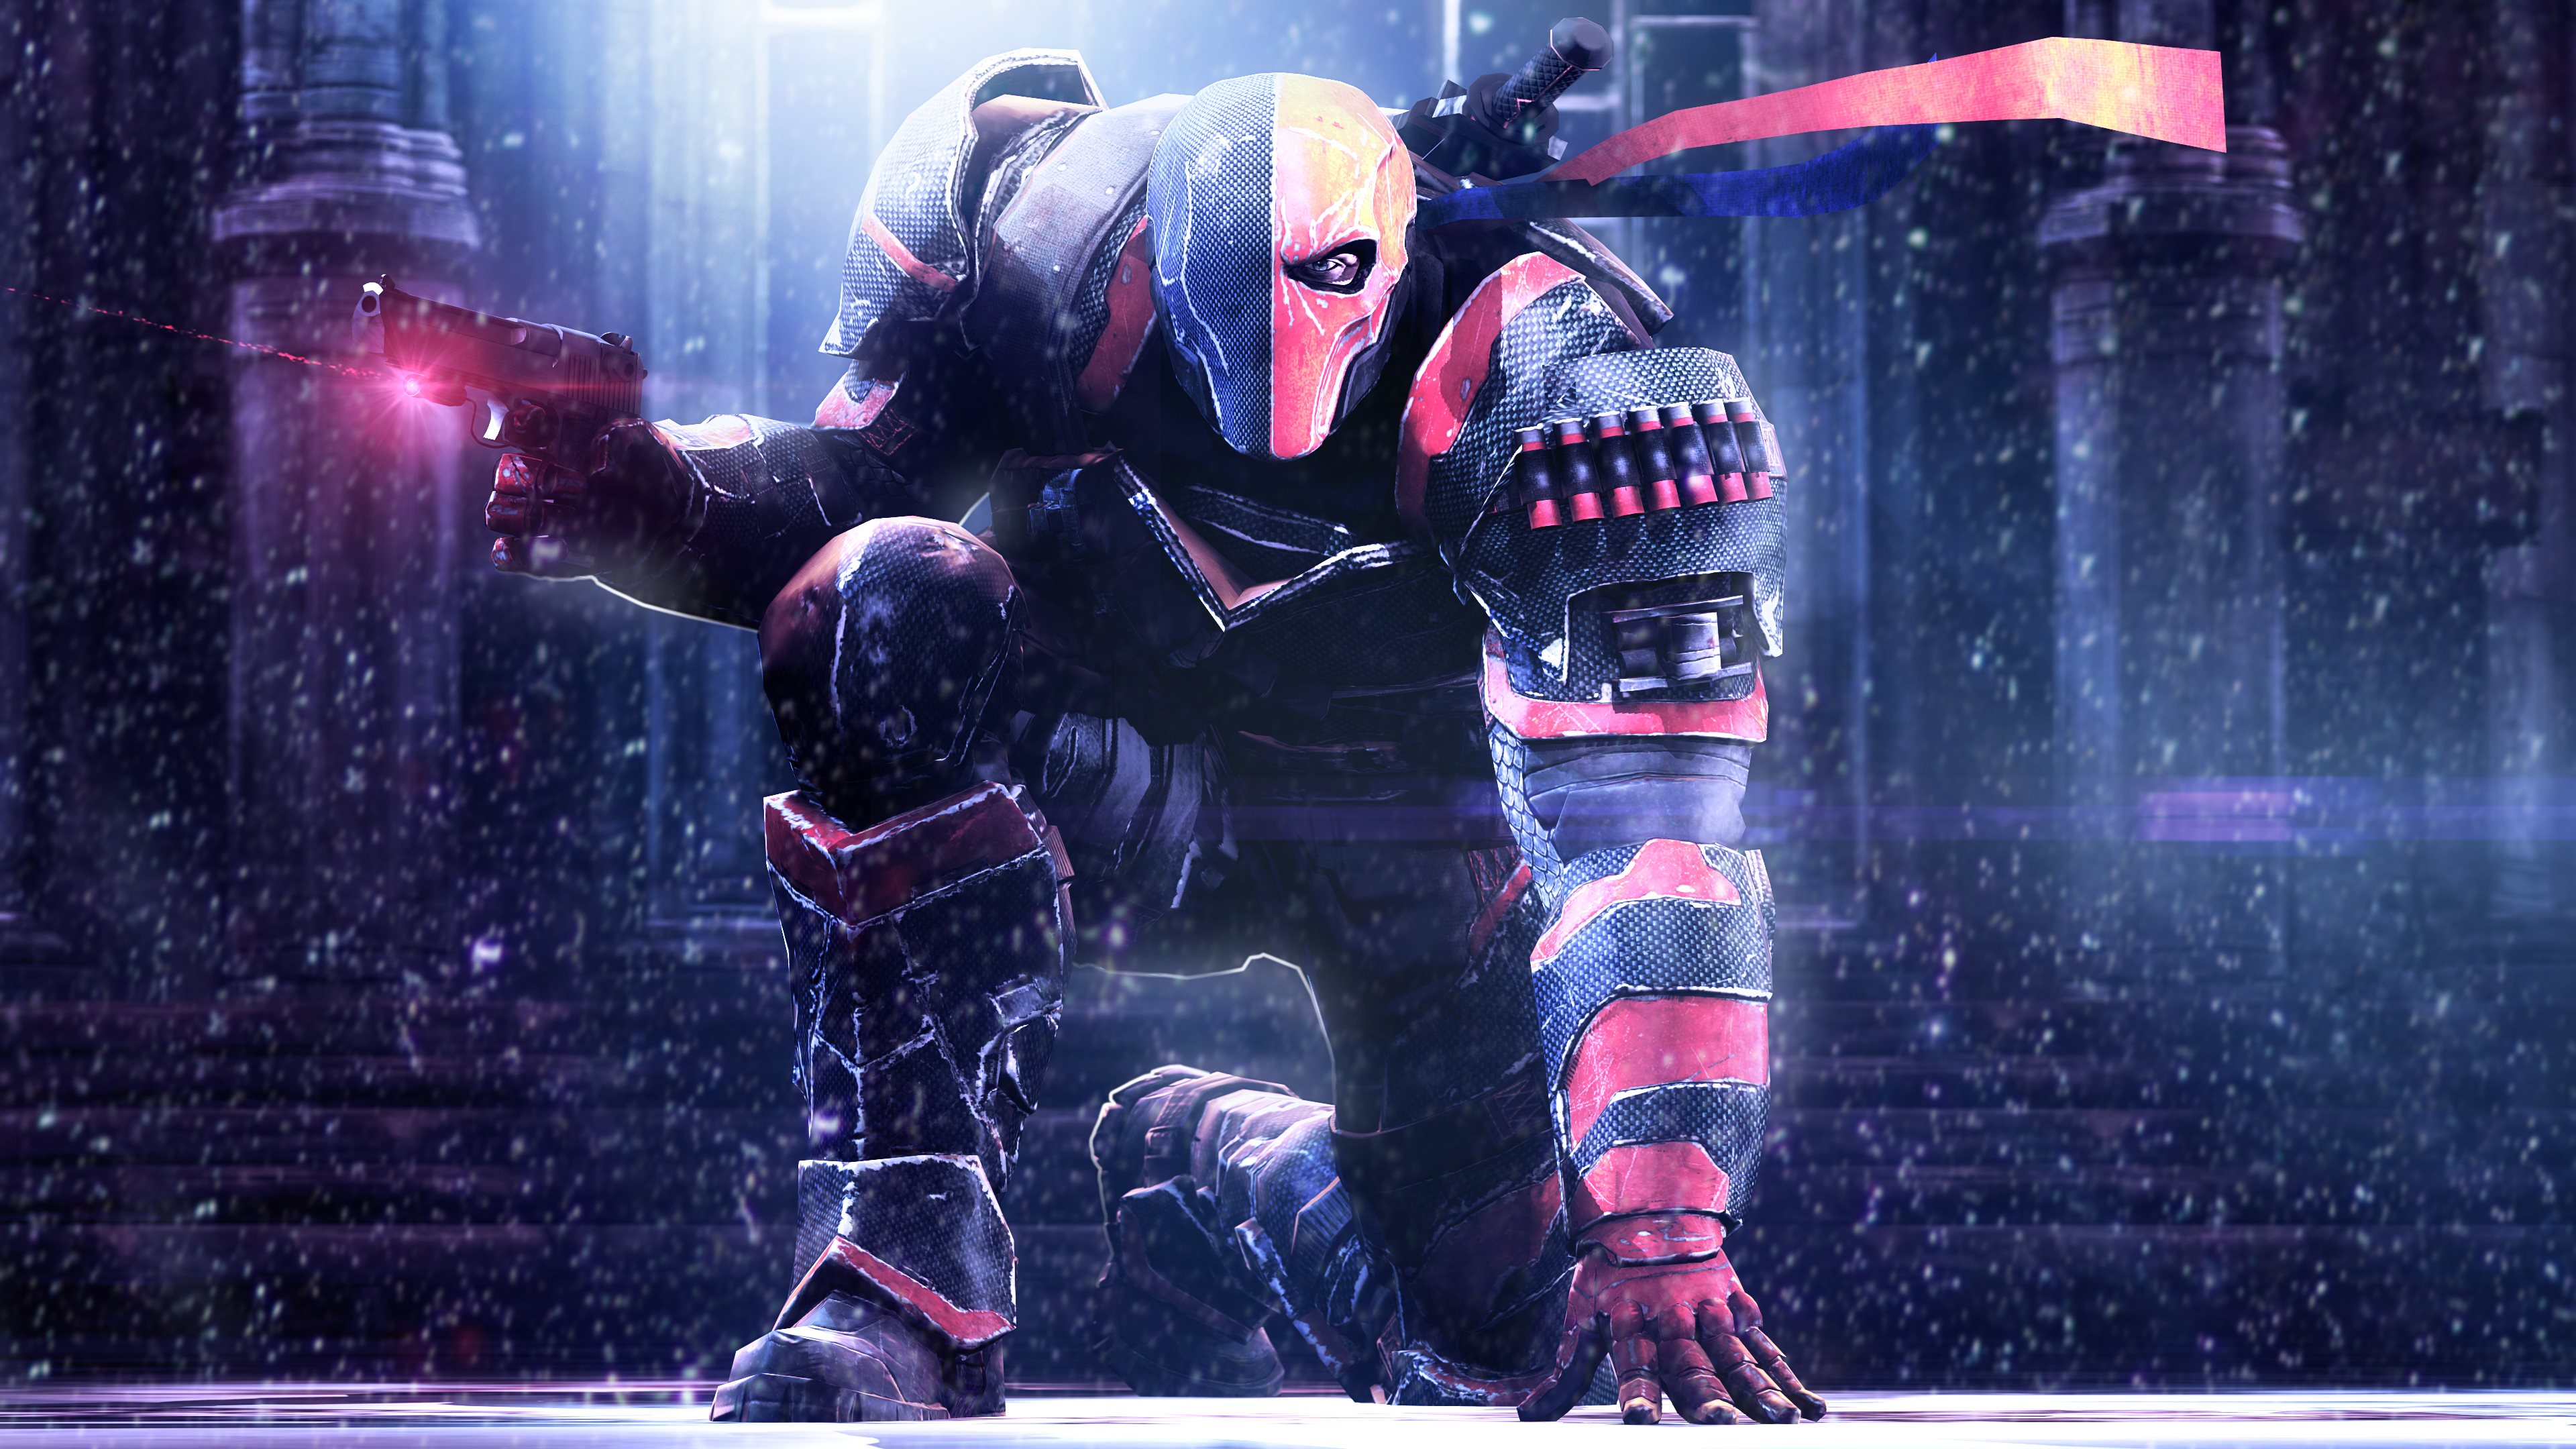 Deathstroke from Batman Arkham Origins also known as Deathstroke the 3840x2160